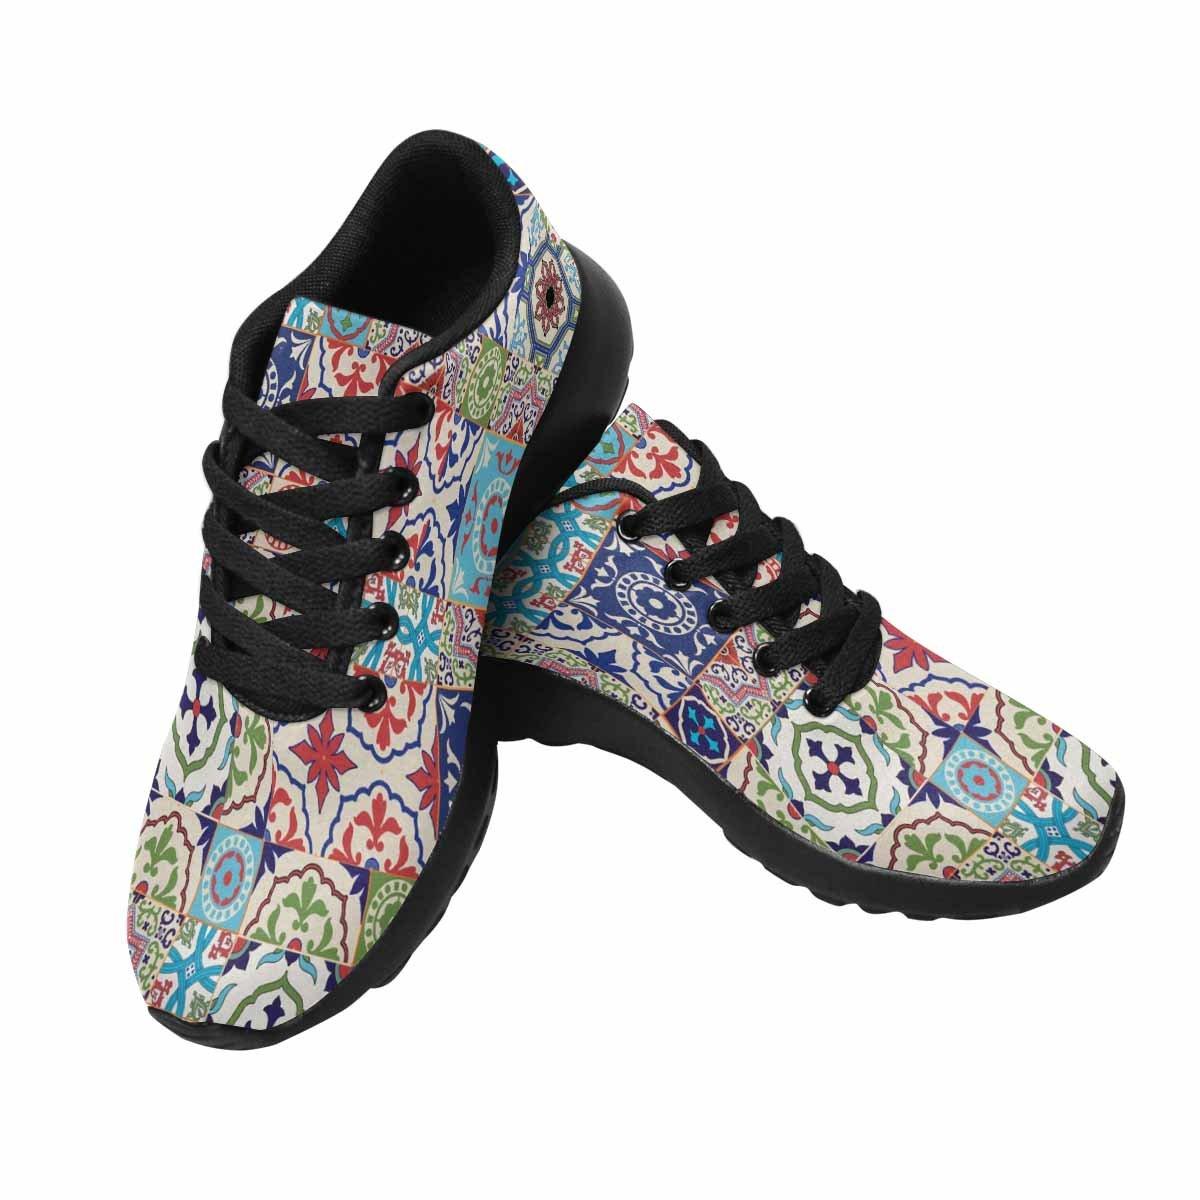 InterestPrint Women's Go Easy Walking Comfort Sports Athletic Shoes Mega Gorgeous Patchwork Pattern US 7